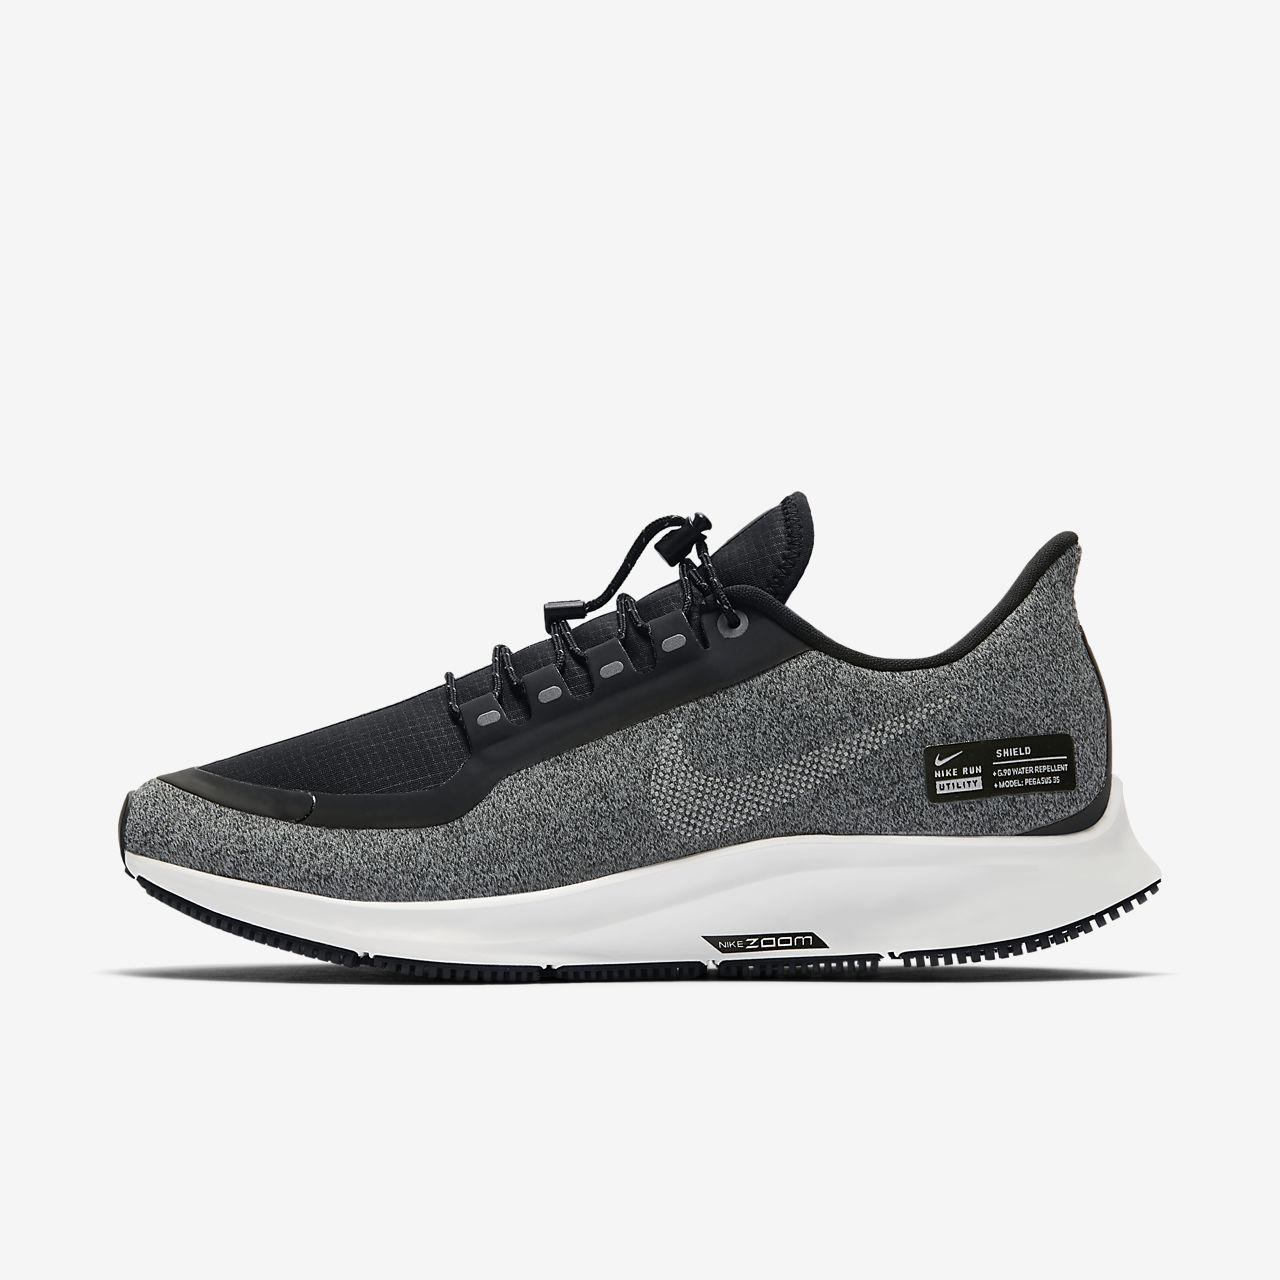 809b236b2f4bf ... sale big discount01 9f3e2 61ad3  where can i buy nike air zoom pegasus  35 shield womens running shoe 84671 71482